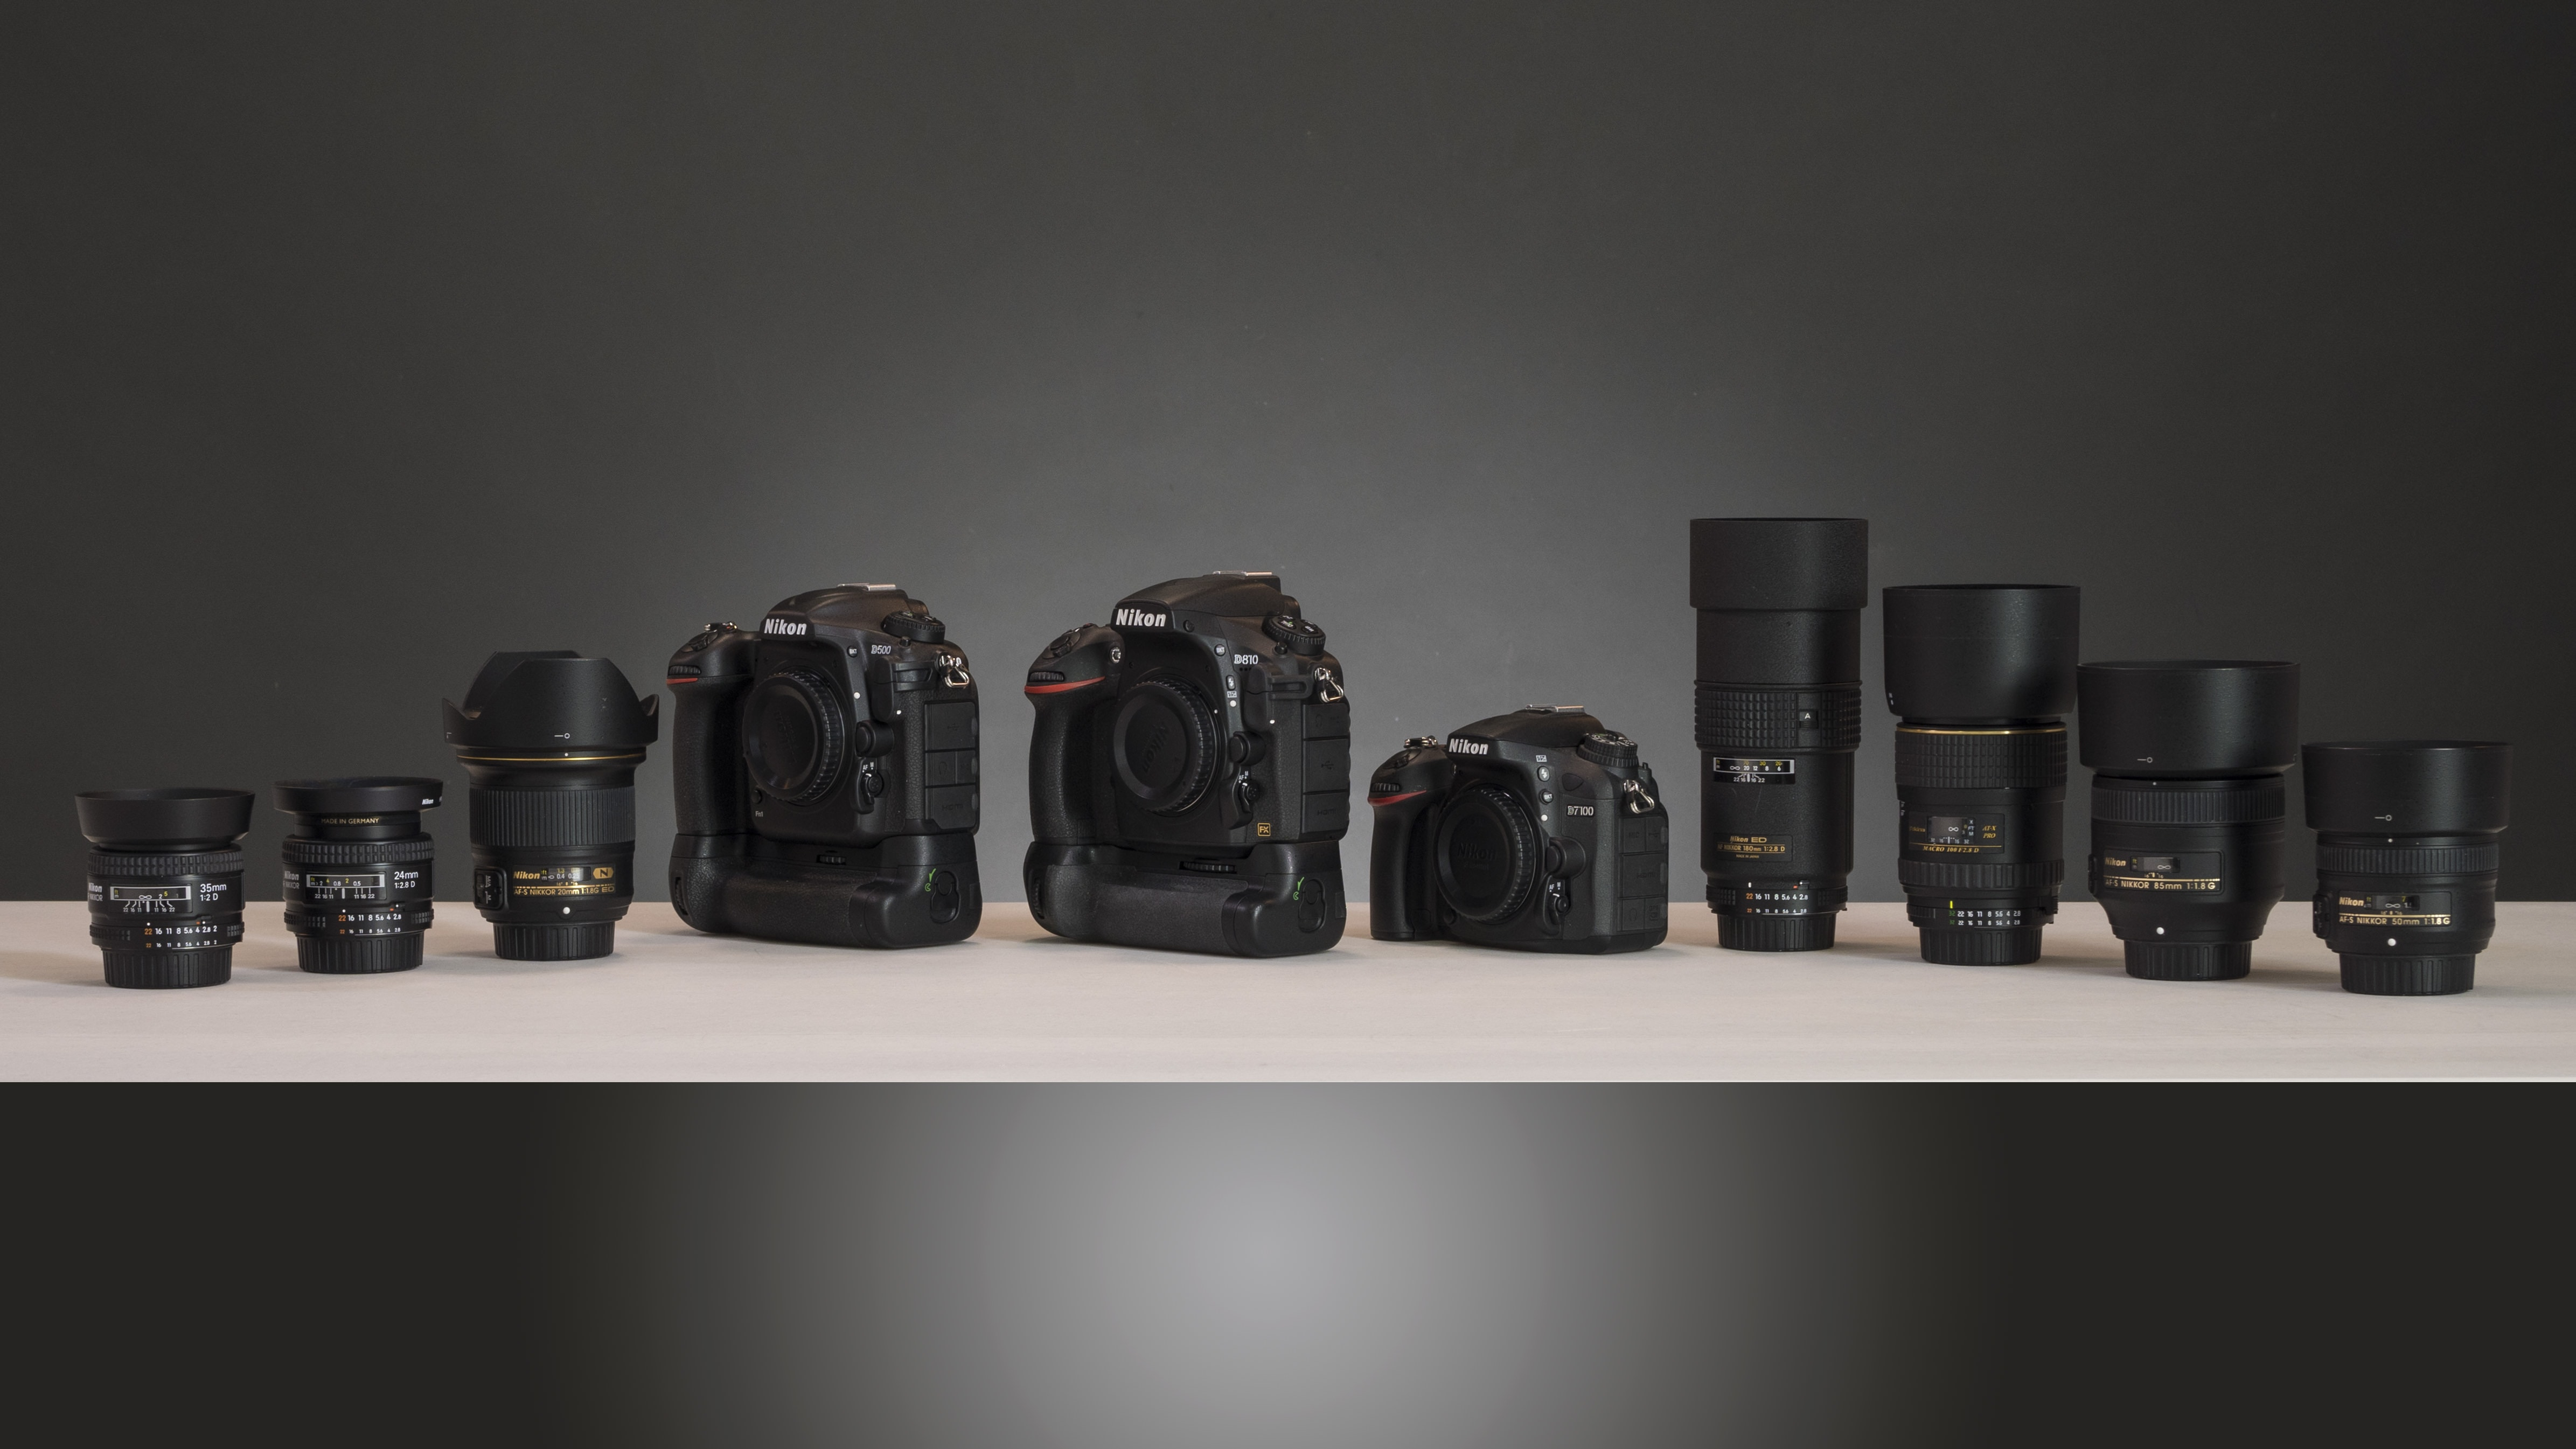 My Nikon camera kit